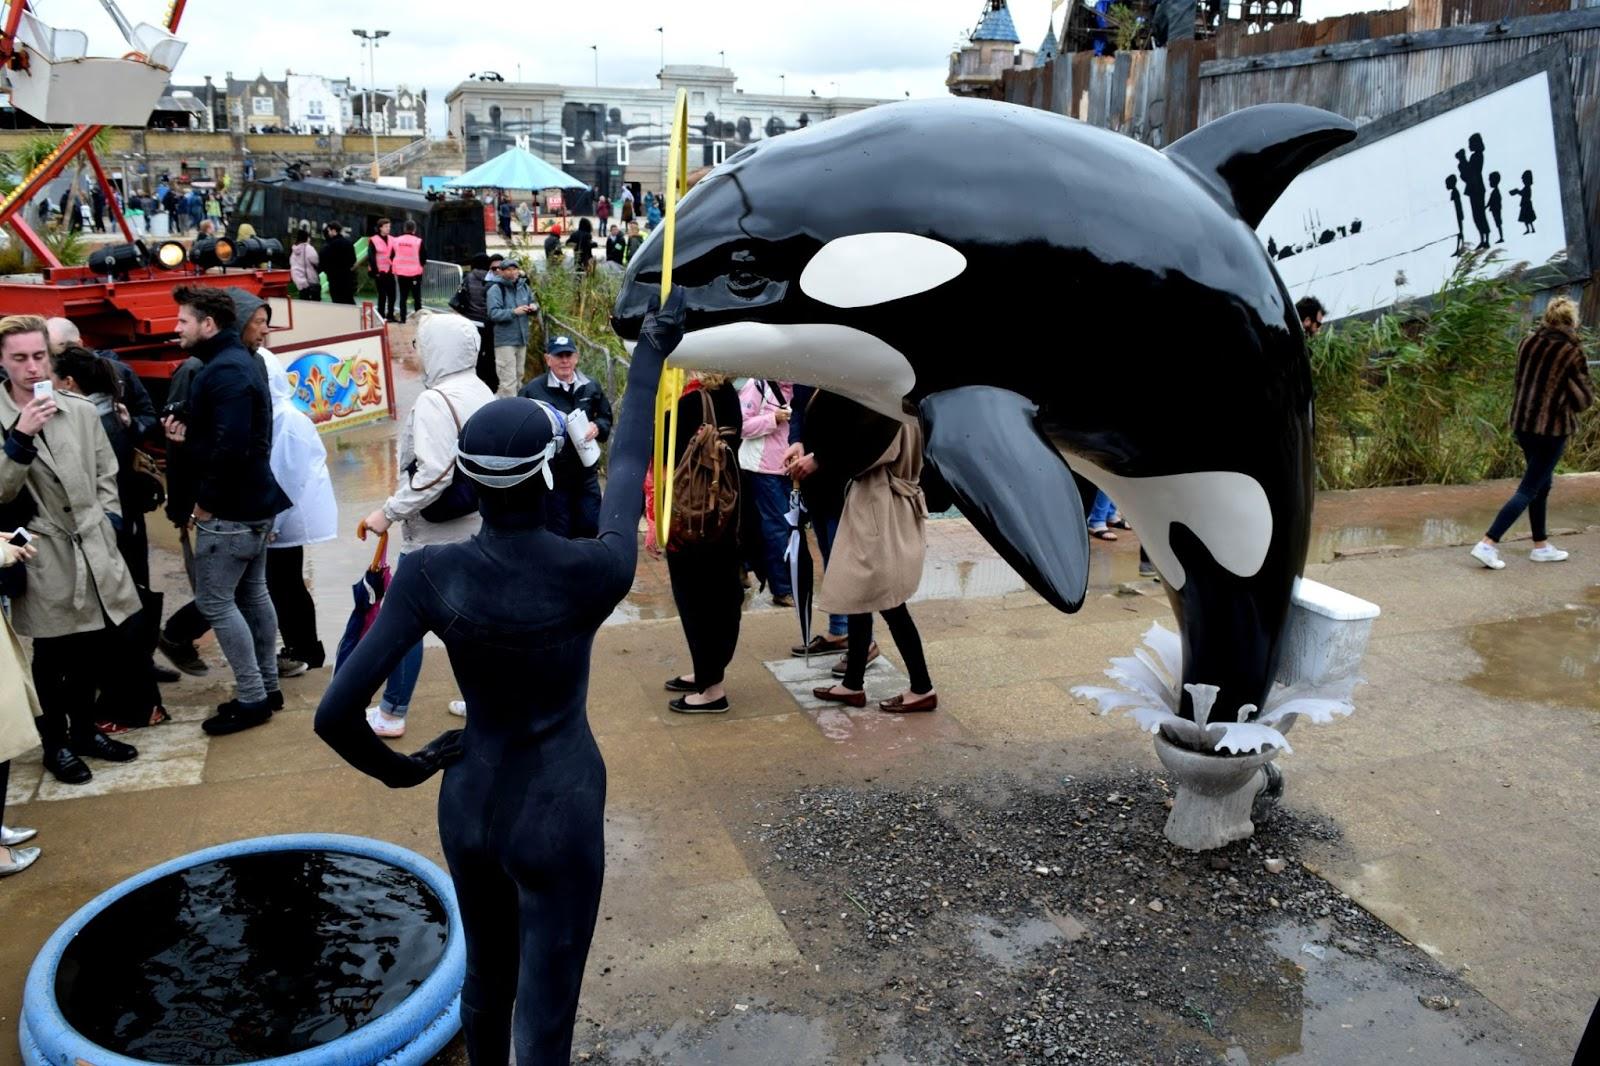 Dismaland Sea World Criticism